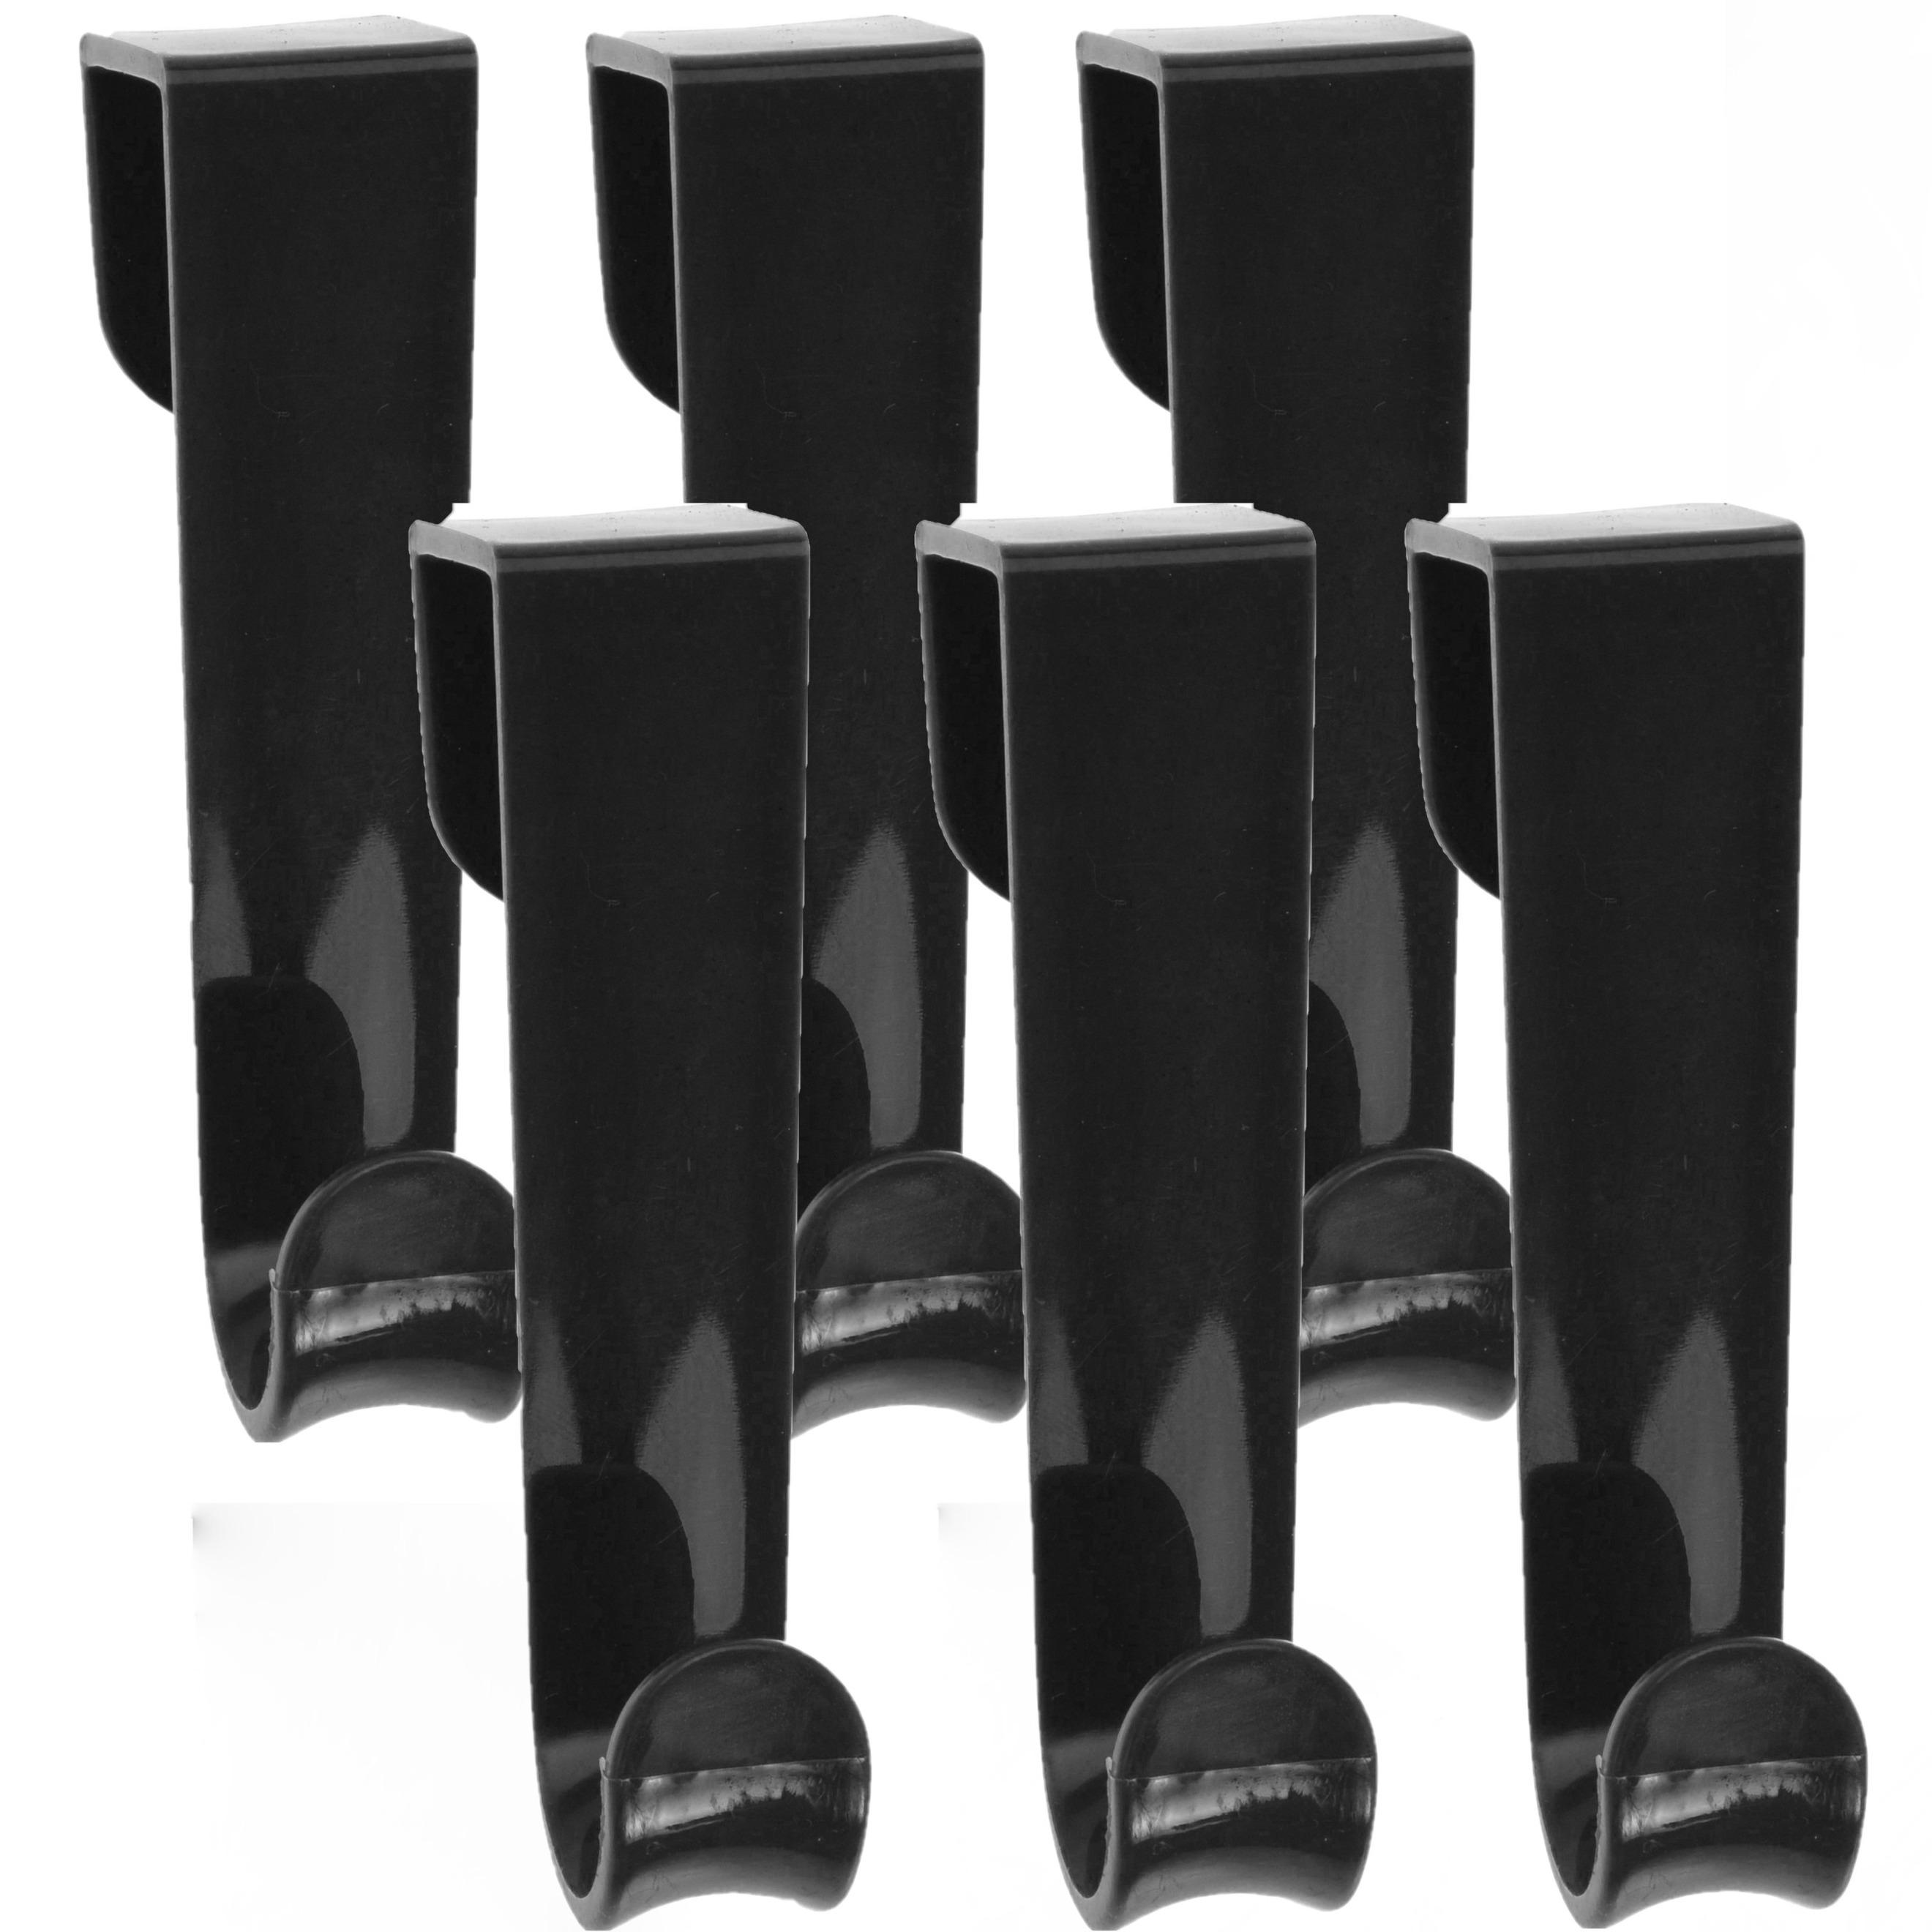 6x Zwarte deur kapstokhaken met enkele haak 12 cm